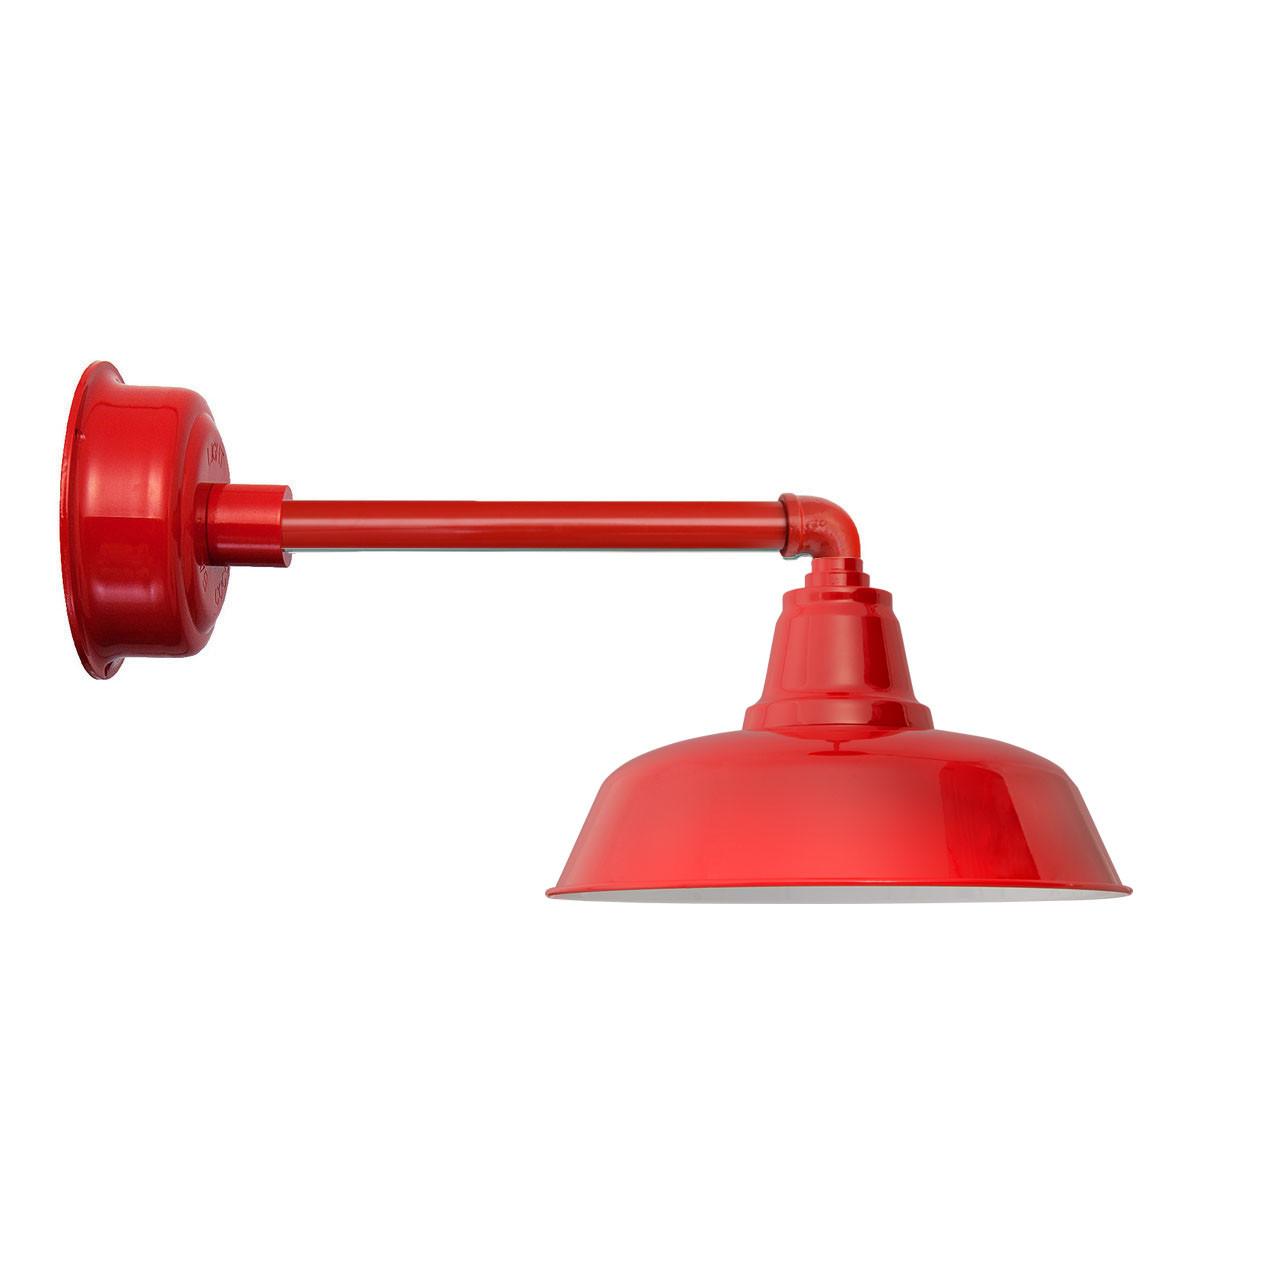 "Goodyear 1 Light Outdoor Barn Light: Goodyear Cherry Red Metropolitan Indoor/Outdoor 14"" LED"